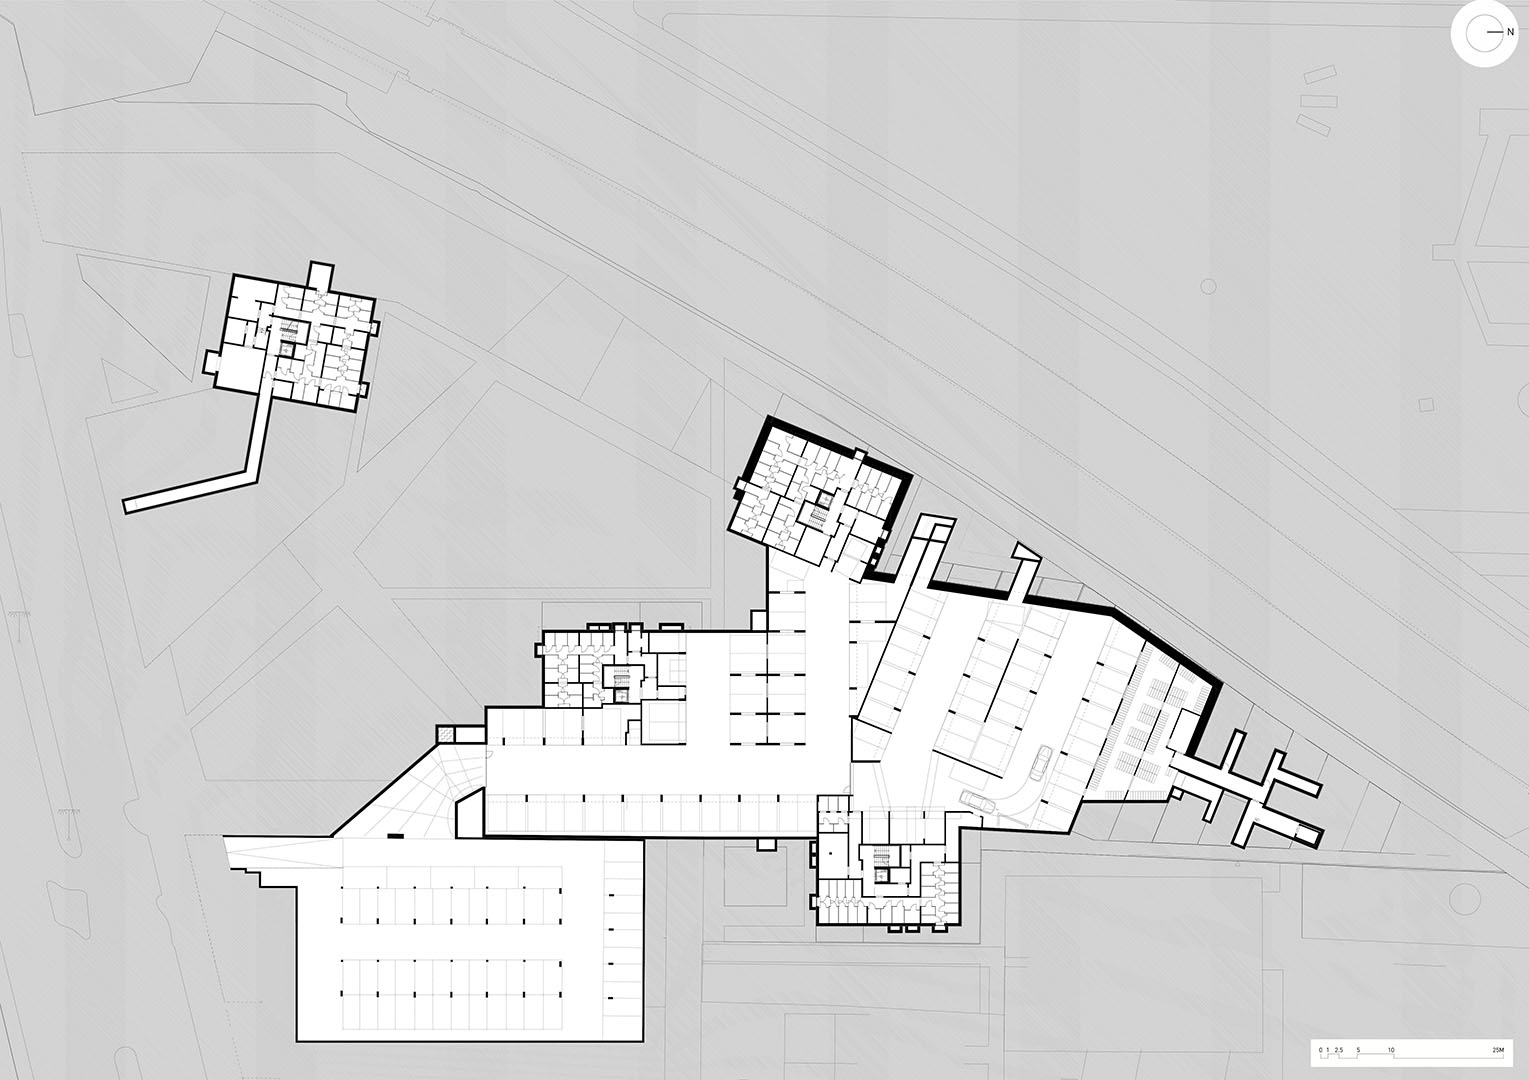 2_Perfektastrasse_Vienna_basement plan